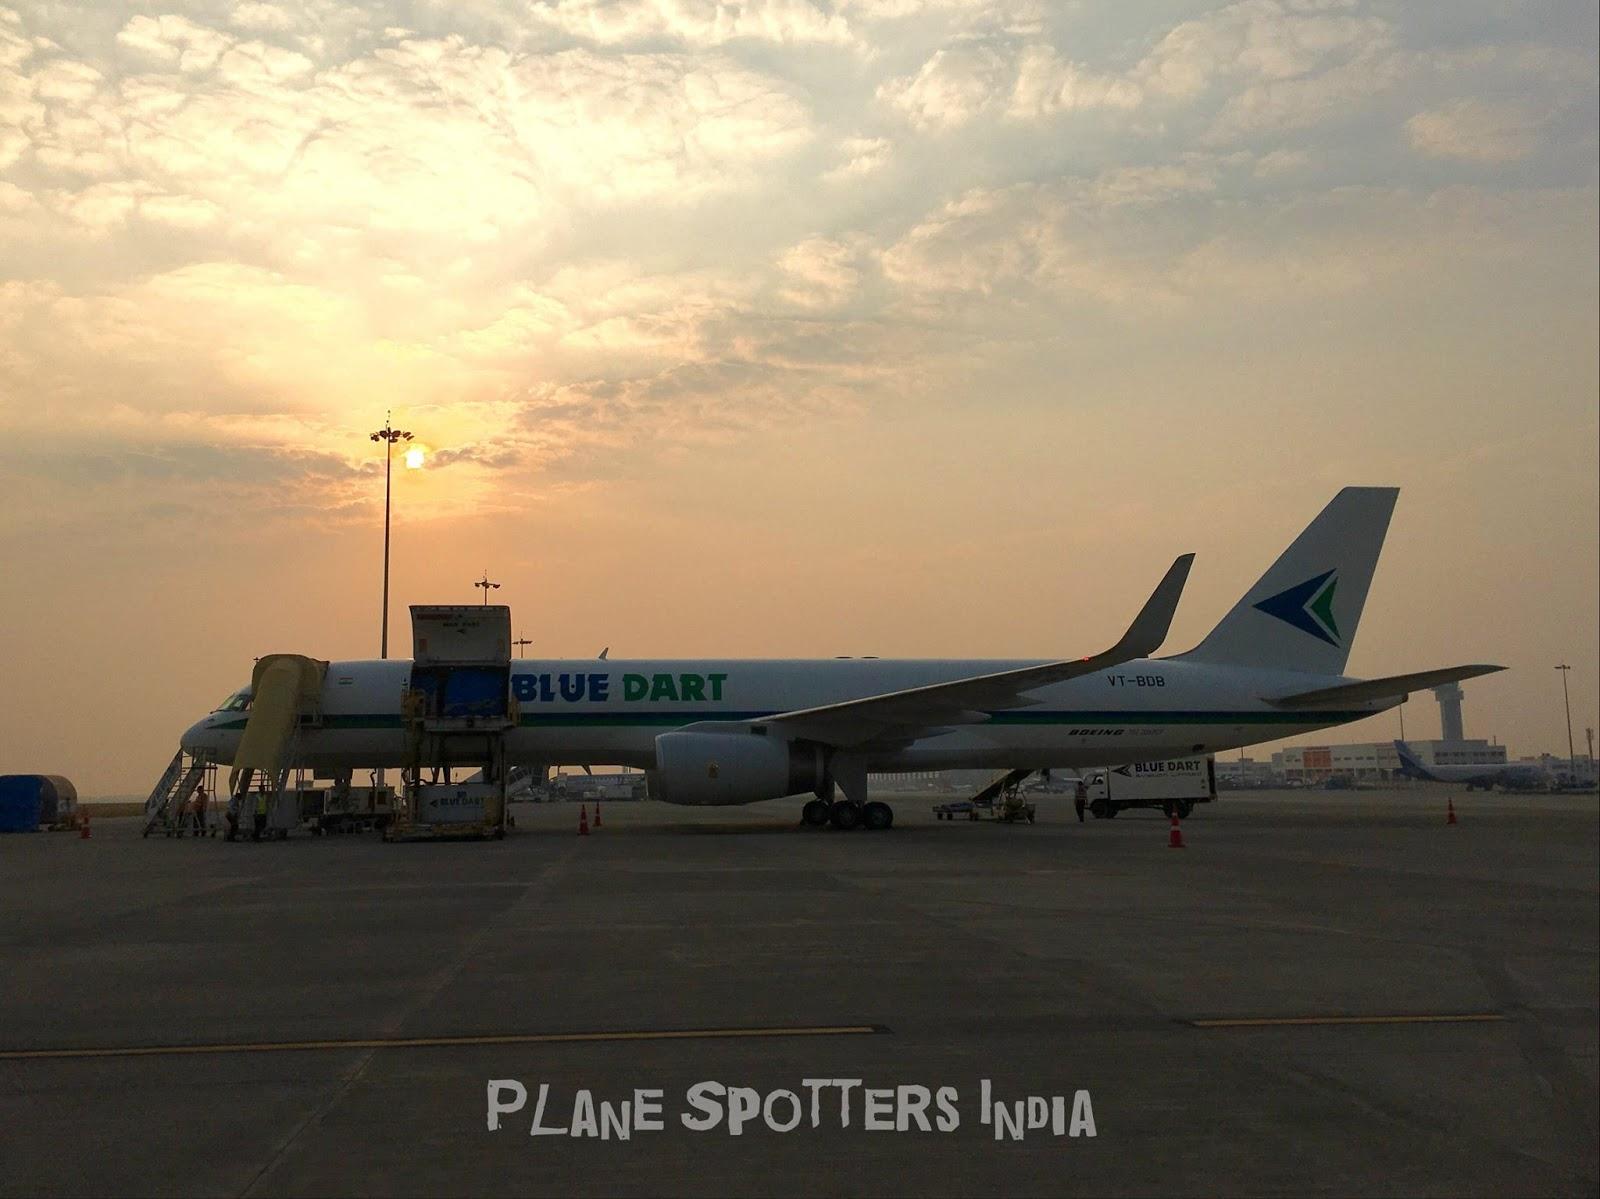 Blue Dart | Boeing 757-200PCF | VT-BDB - Plane Spotters India - www